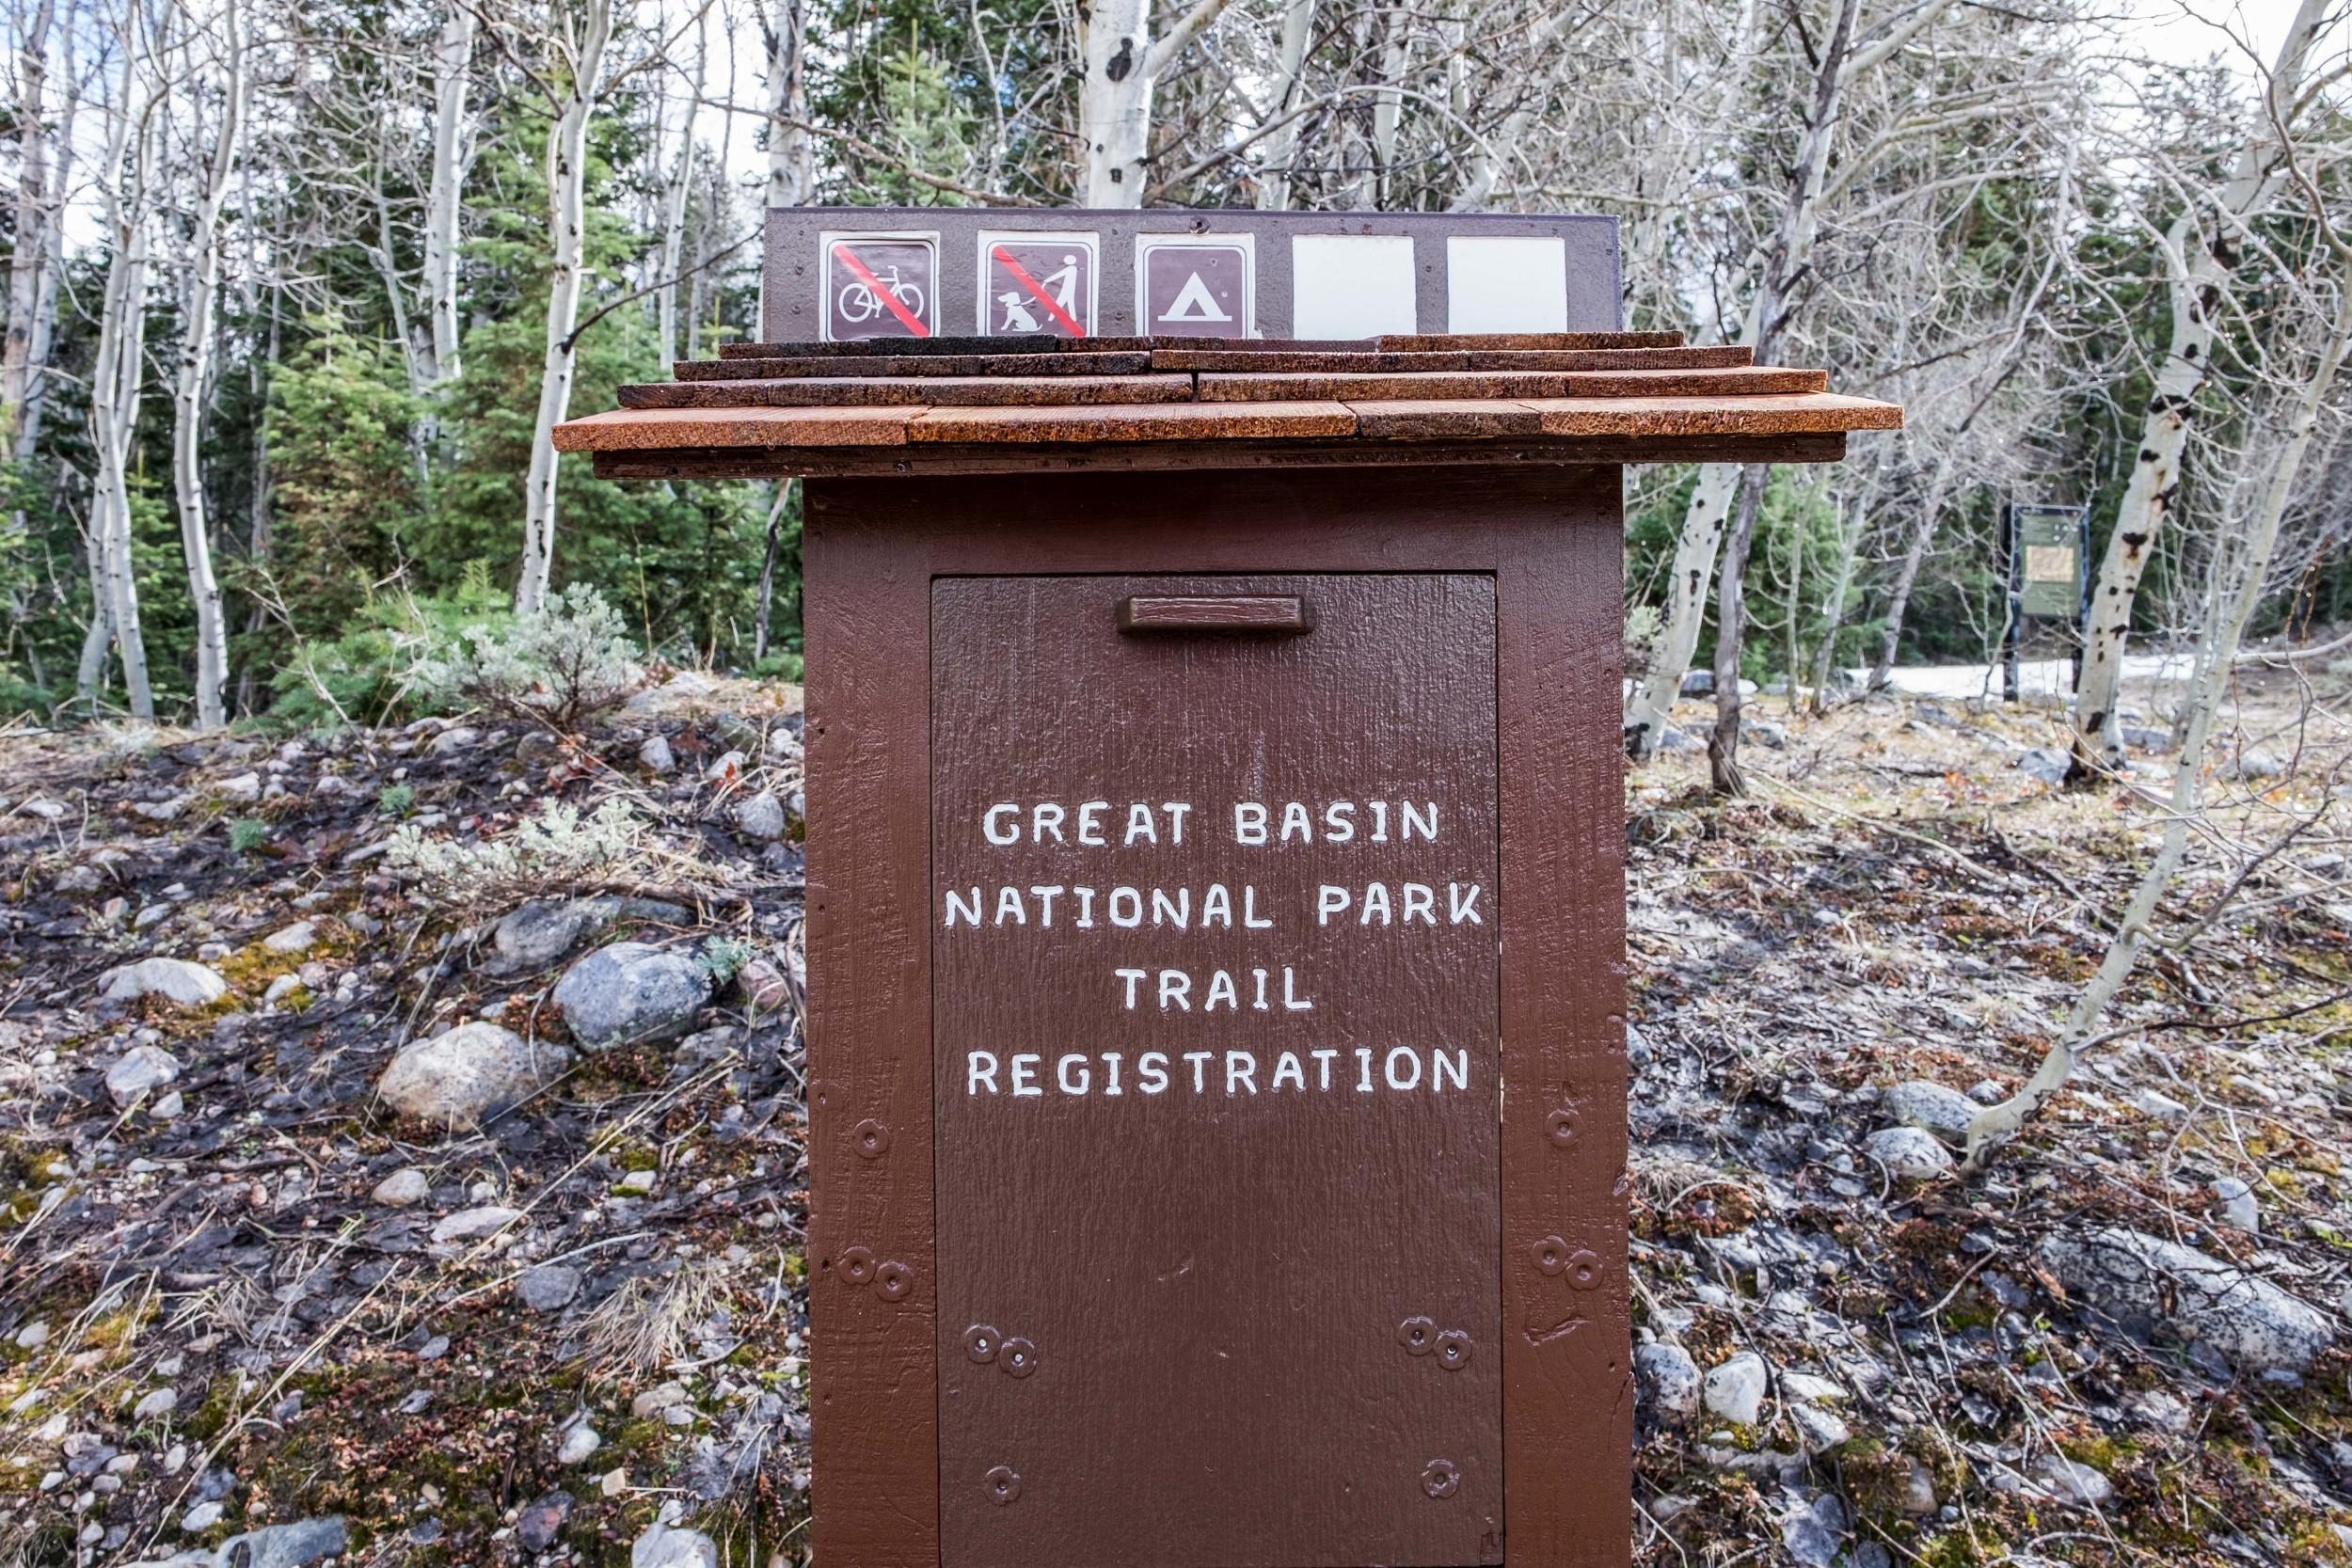 20160413-JI-Great Basin National Park-_DSF1793.jpg